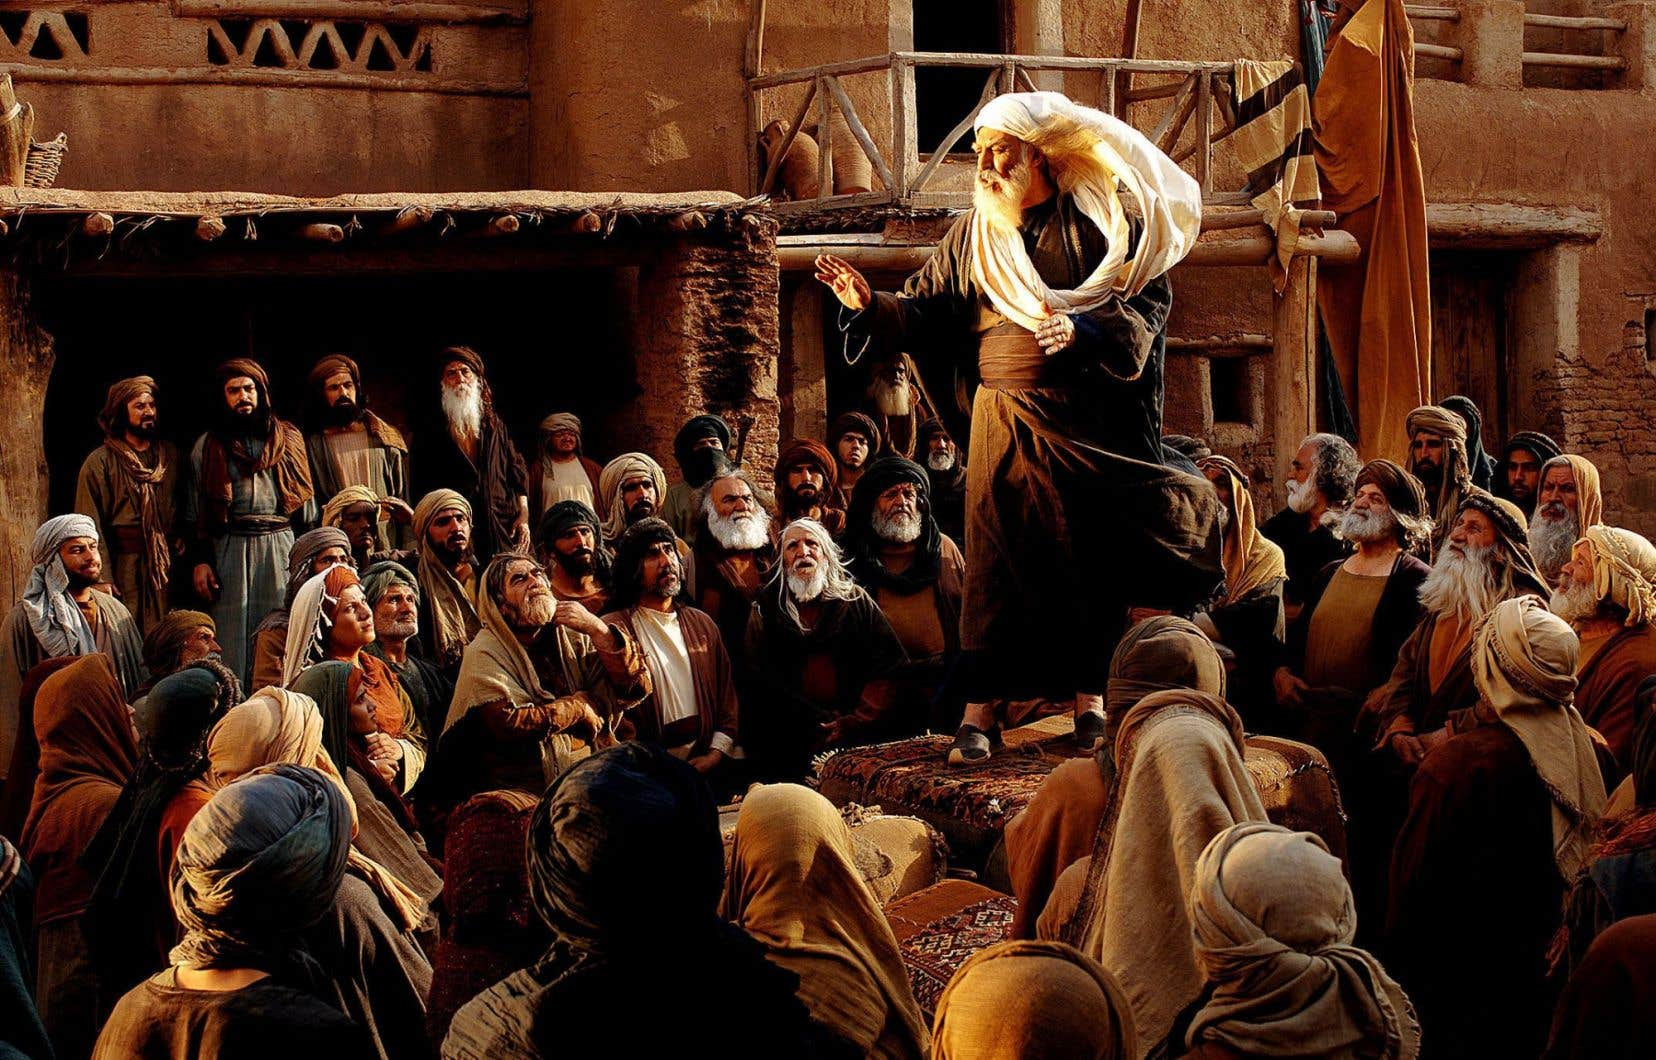 Scène du film «Mohammad», de l'Iranien Majid Majidi, sur l'enfance du prophète Mahomet